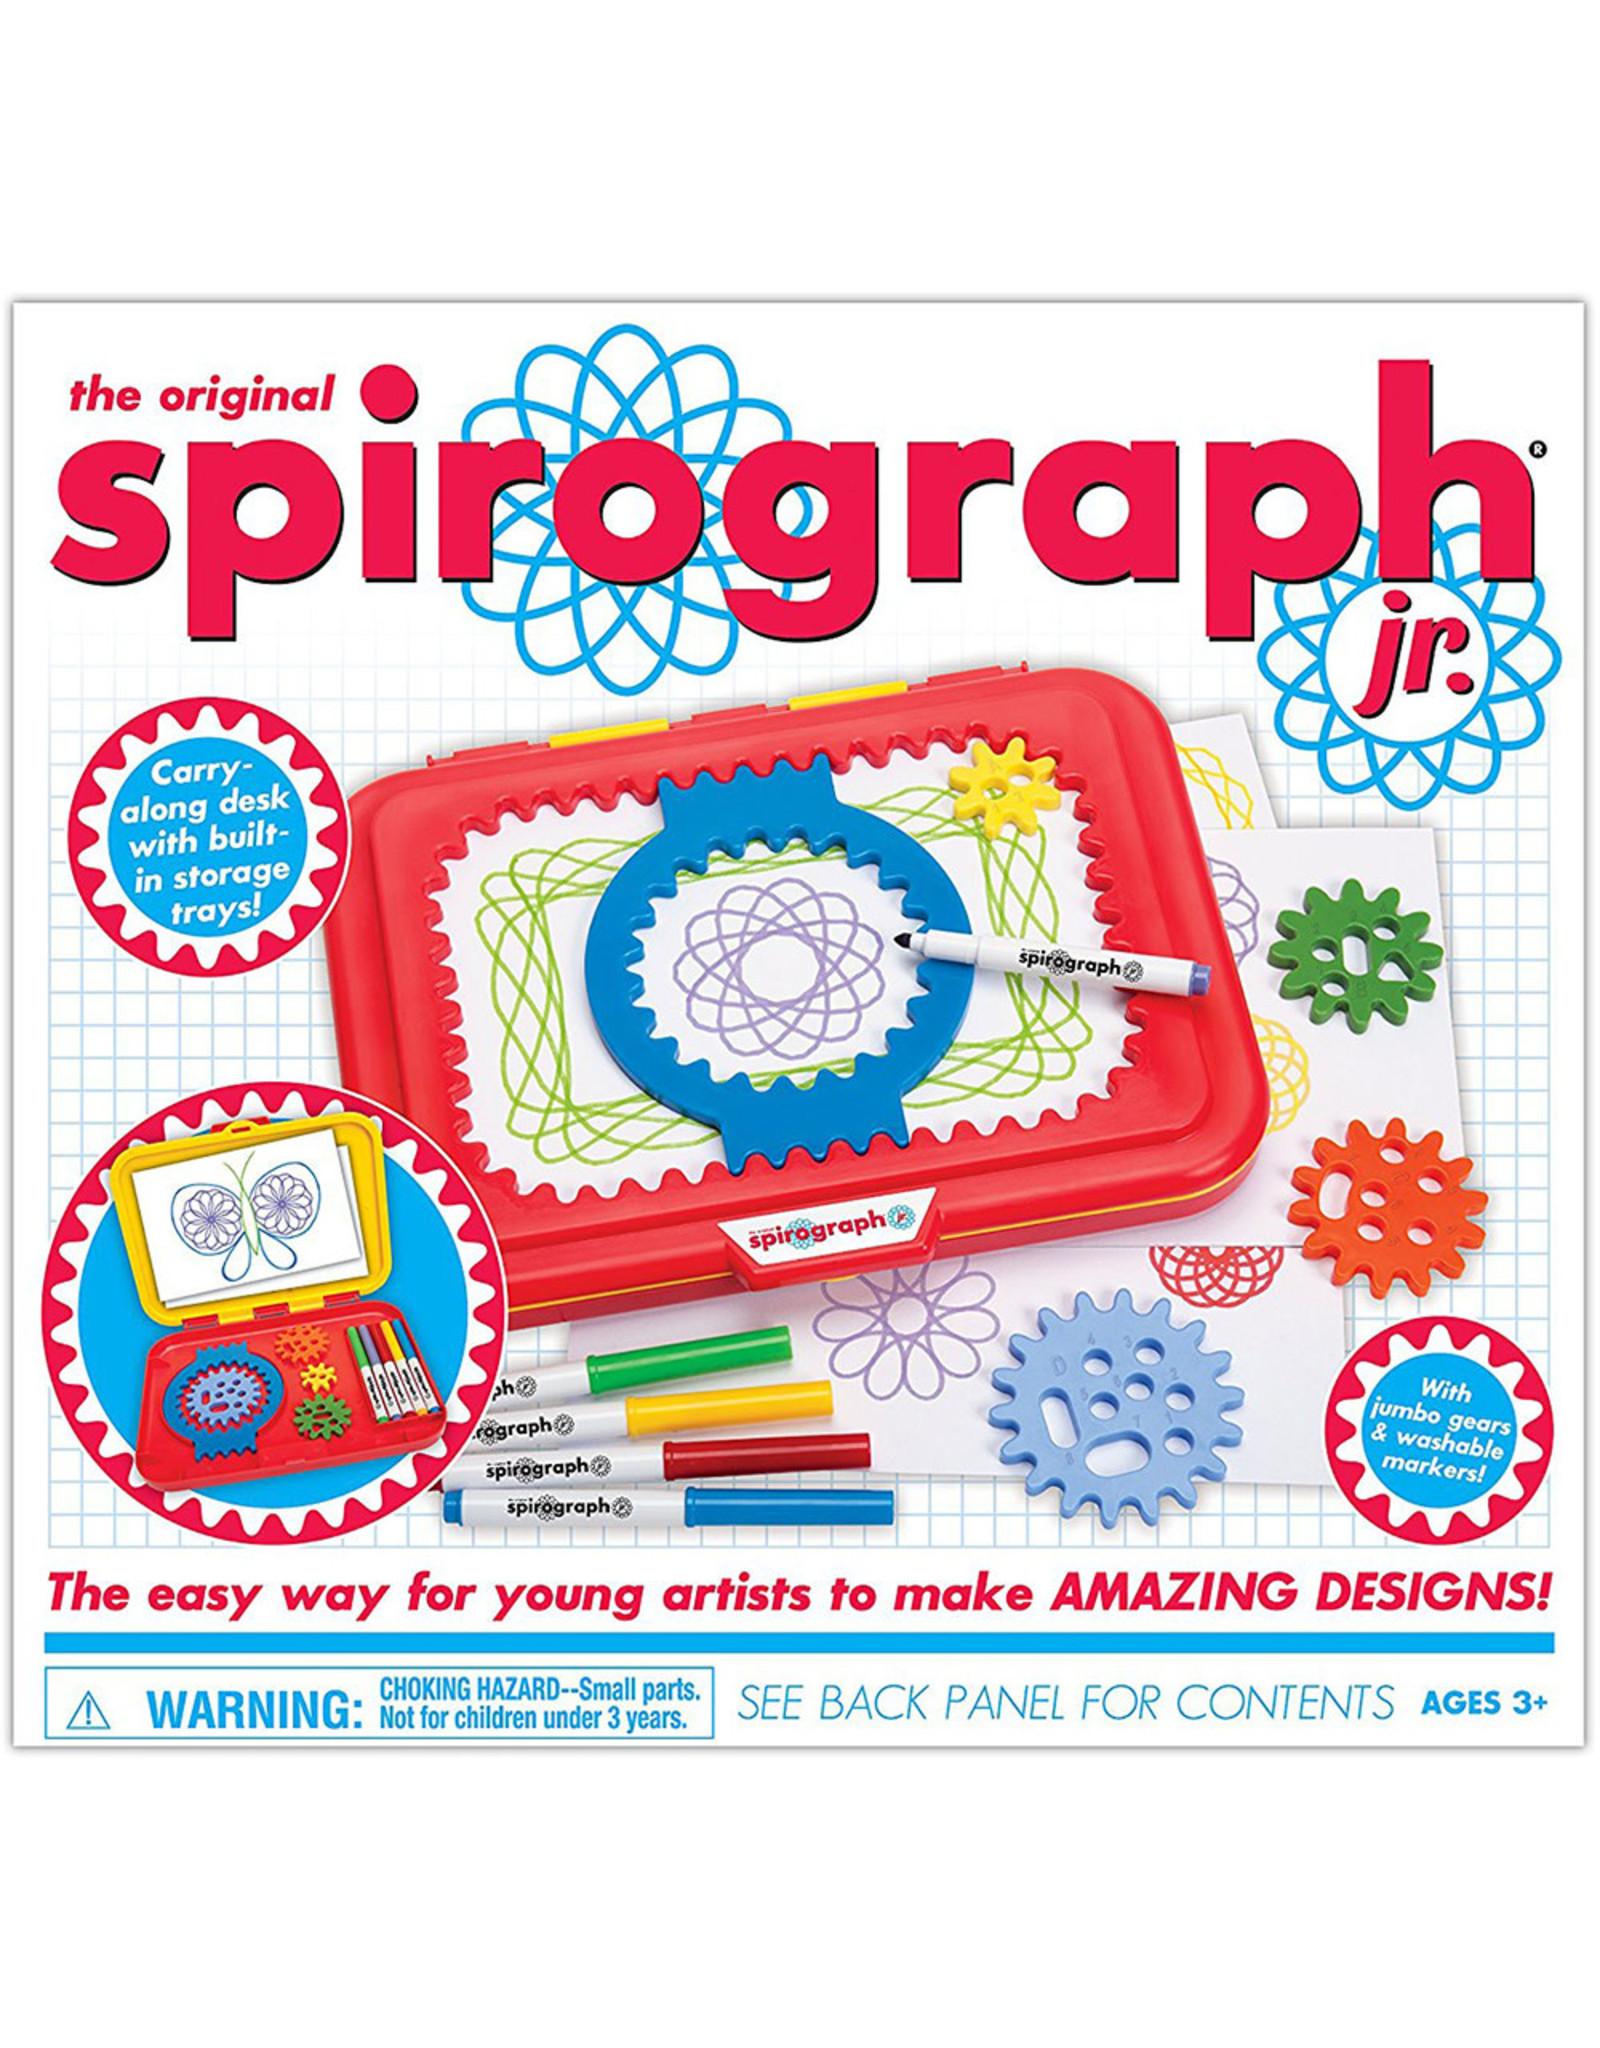 HASBRO THE ORIGINAL SPIROGRAPH JR.